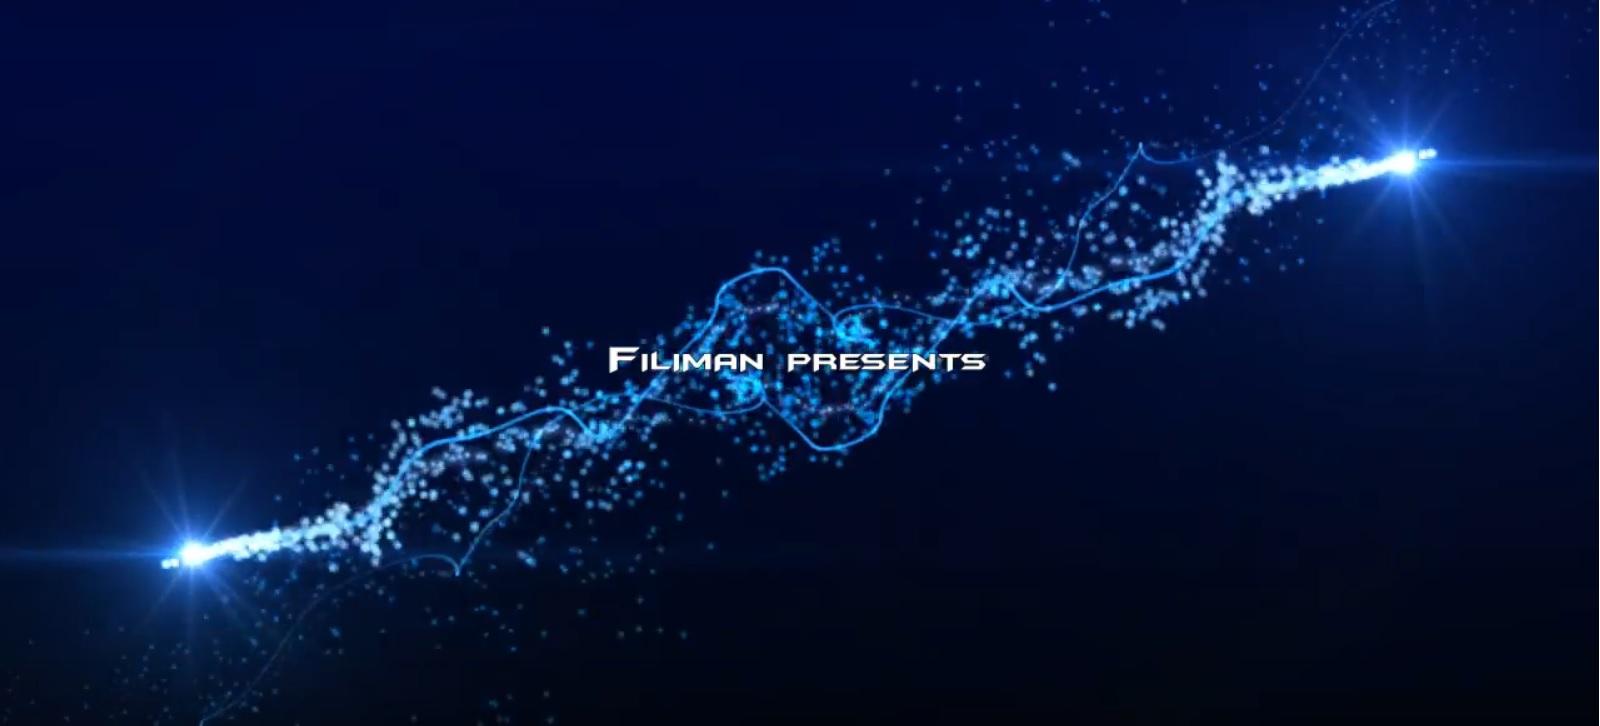 Filiman presents